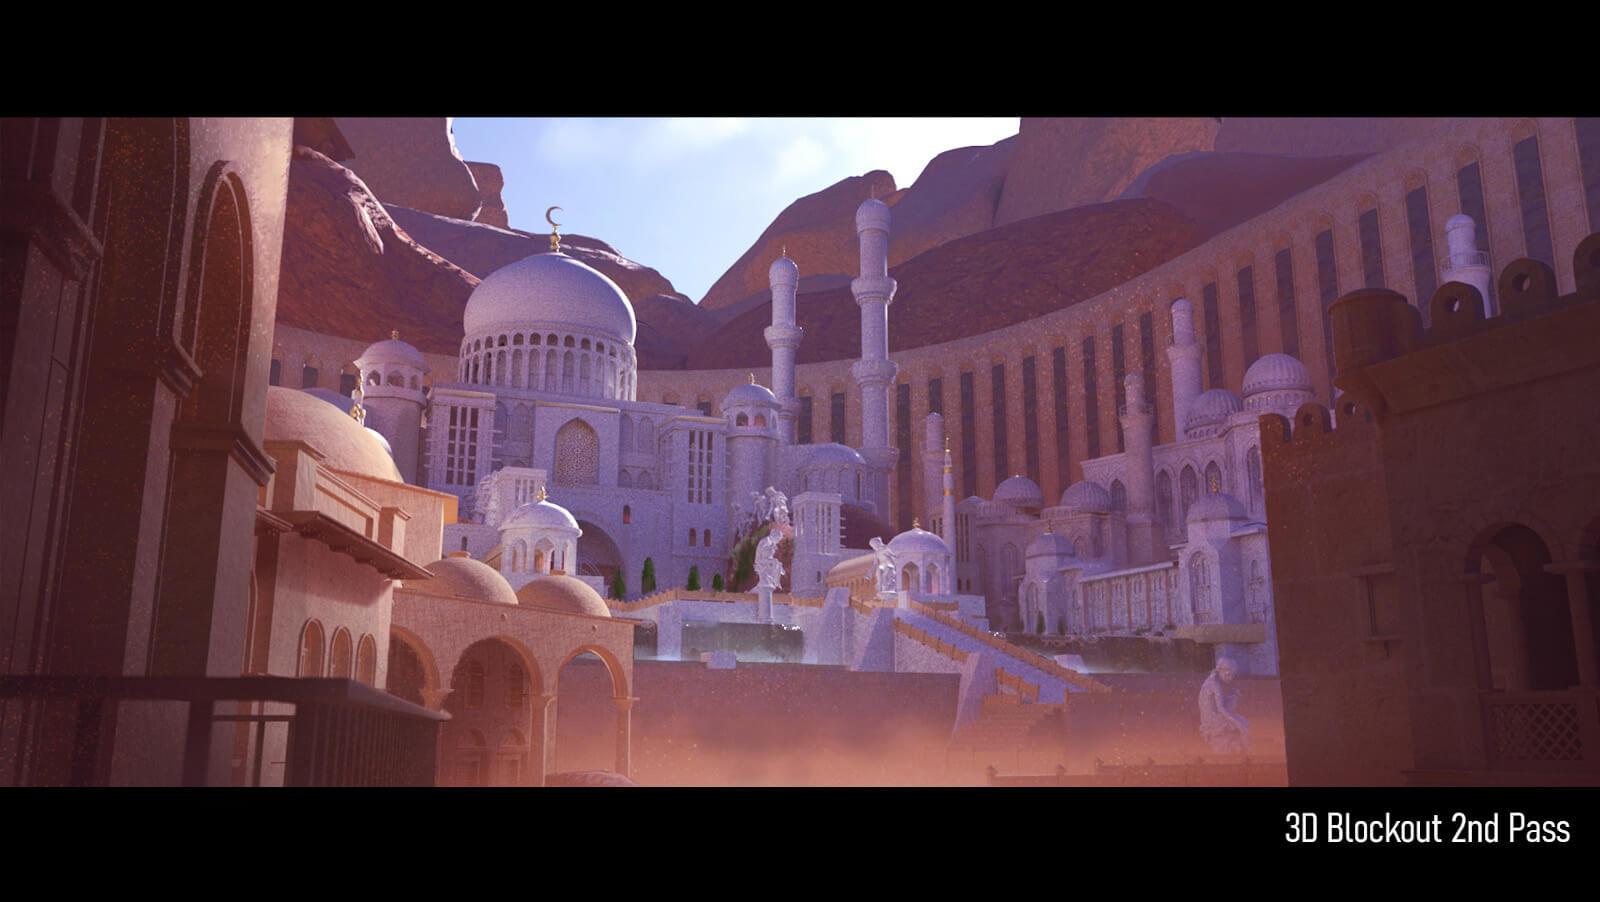 3D temple model block out pass